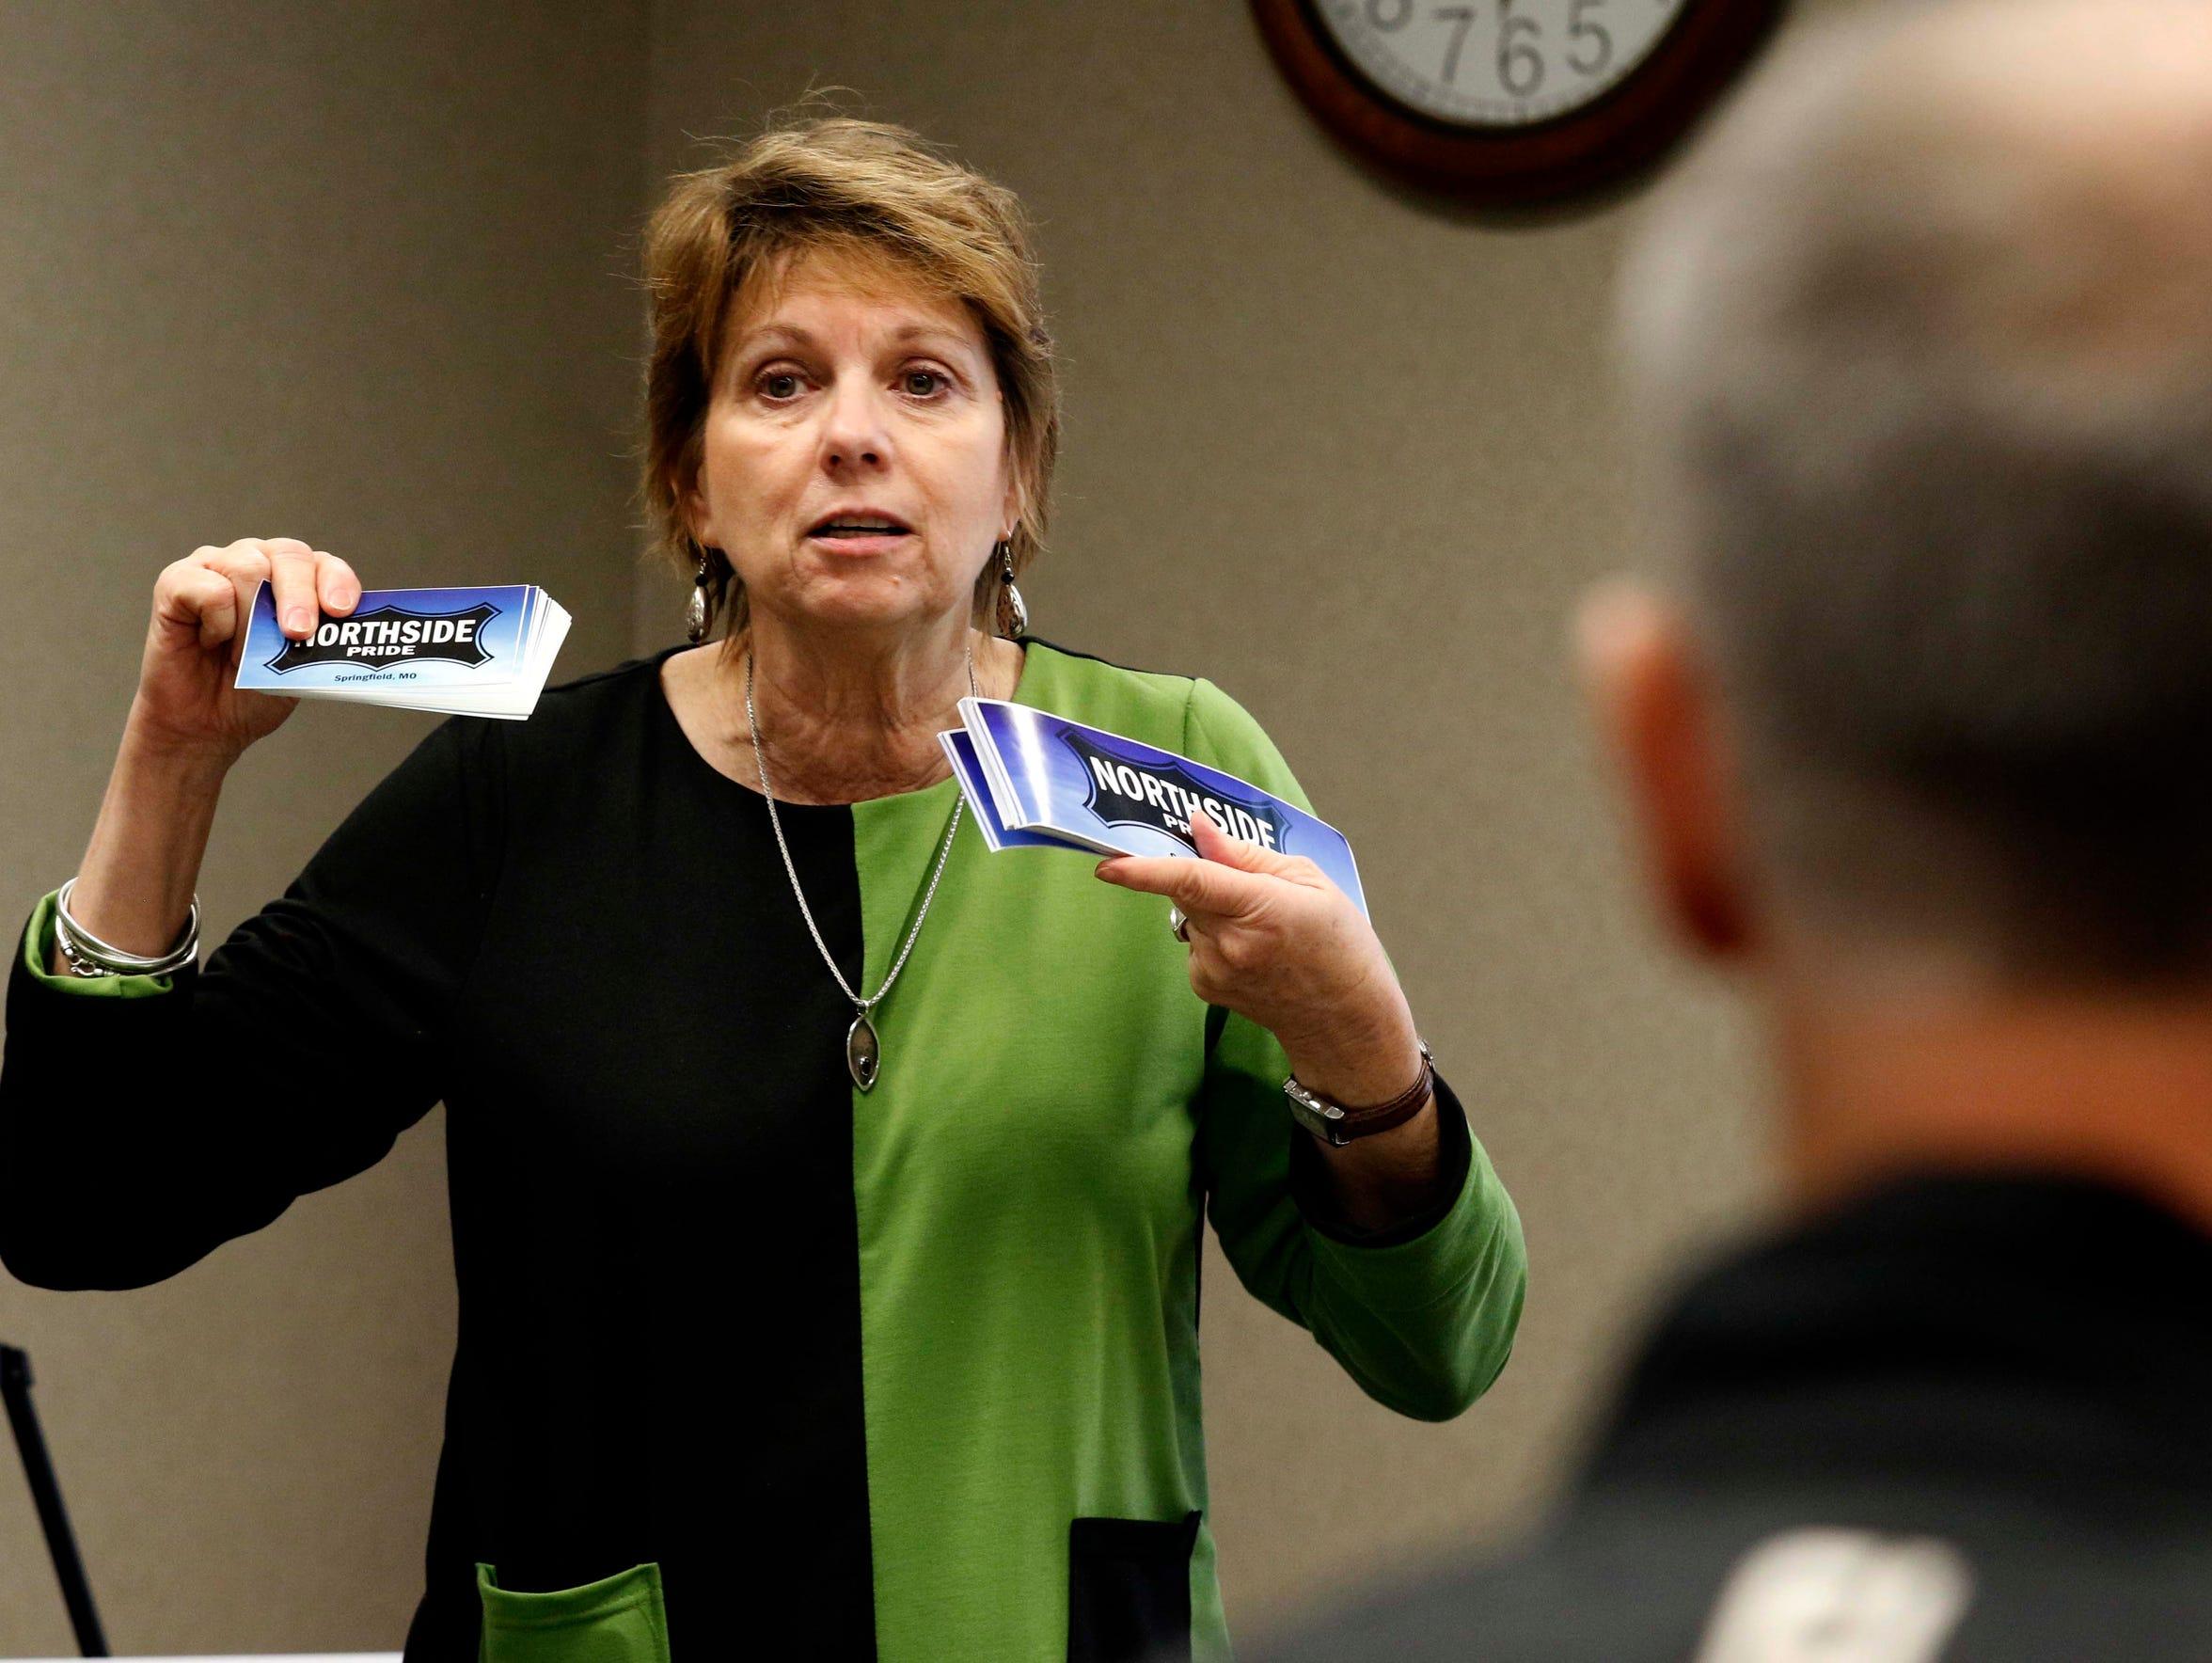 "Zone 1 representative Phyllis Ferguson hands out ""Northside"